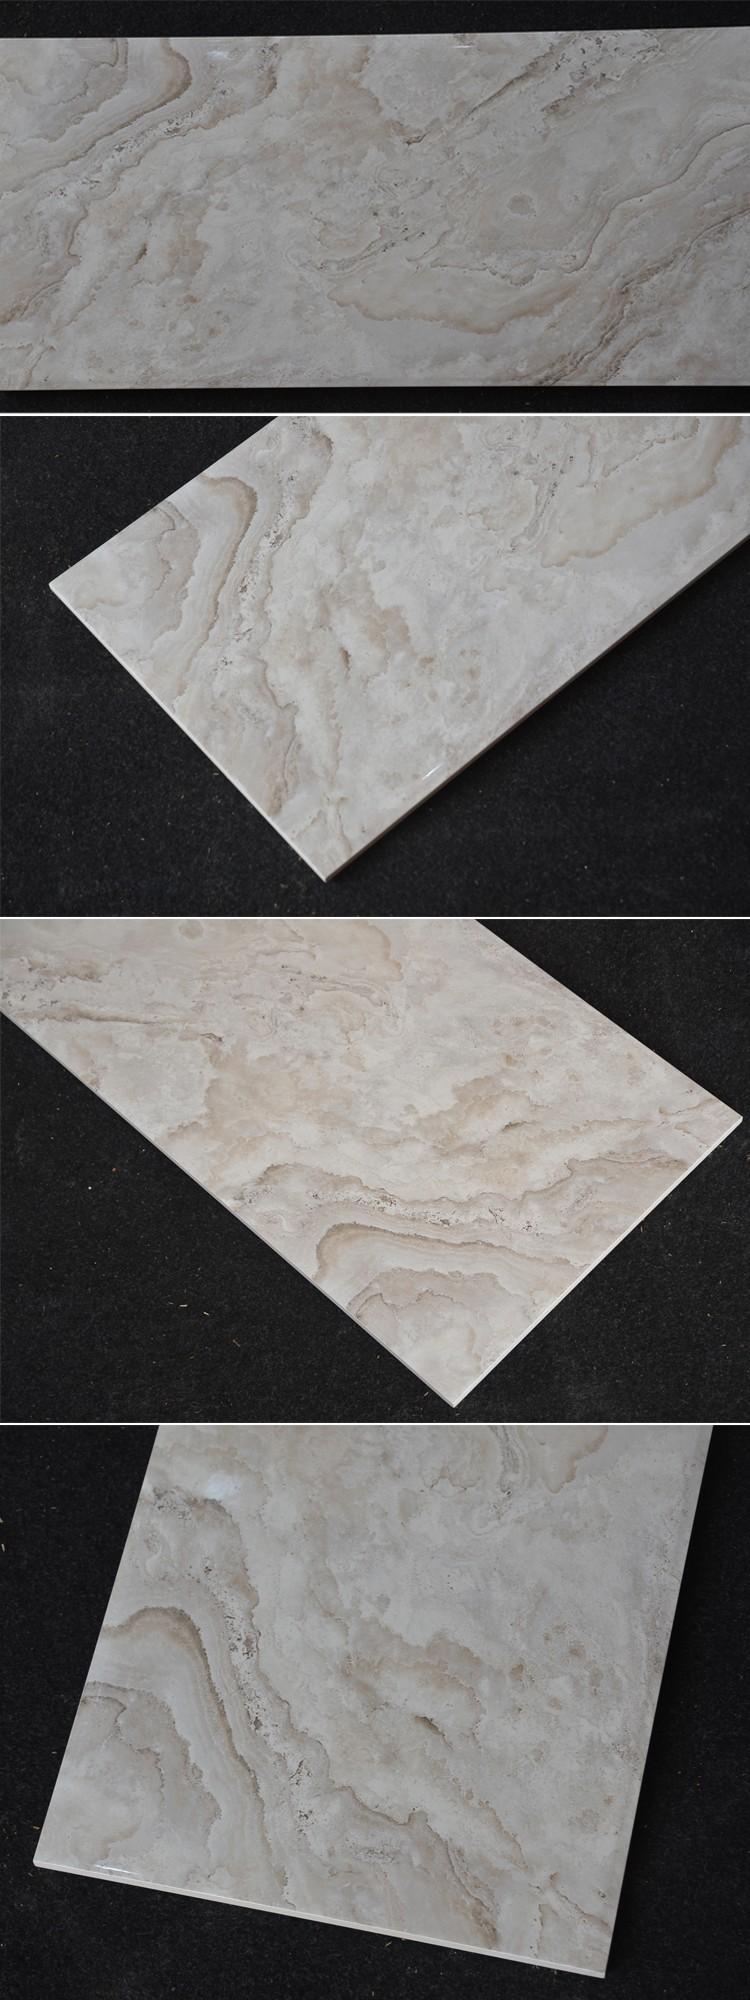 Hm3661la wall tile bajaj tiles vinyl tile wall dubai ceramic hm3661la wall tile bajaj tiles vinyl tile wall dubai ceramic glazed wall tile dailygadgetfo Image collections